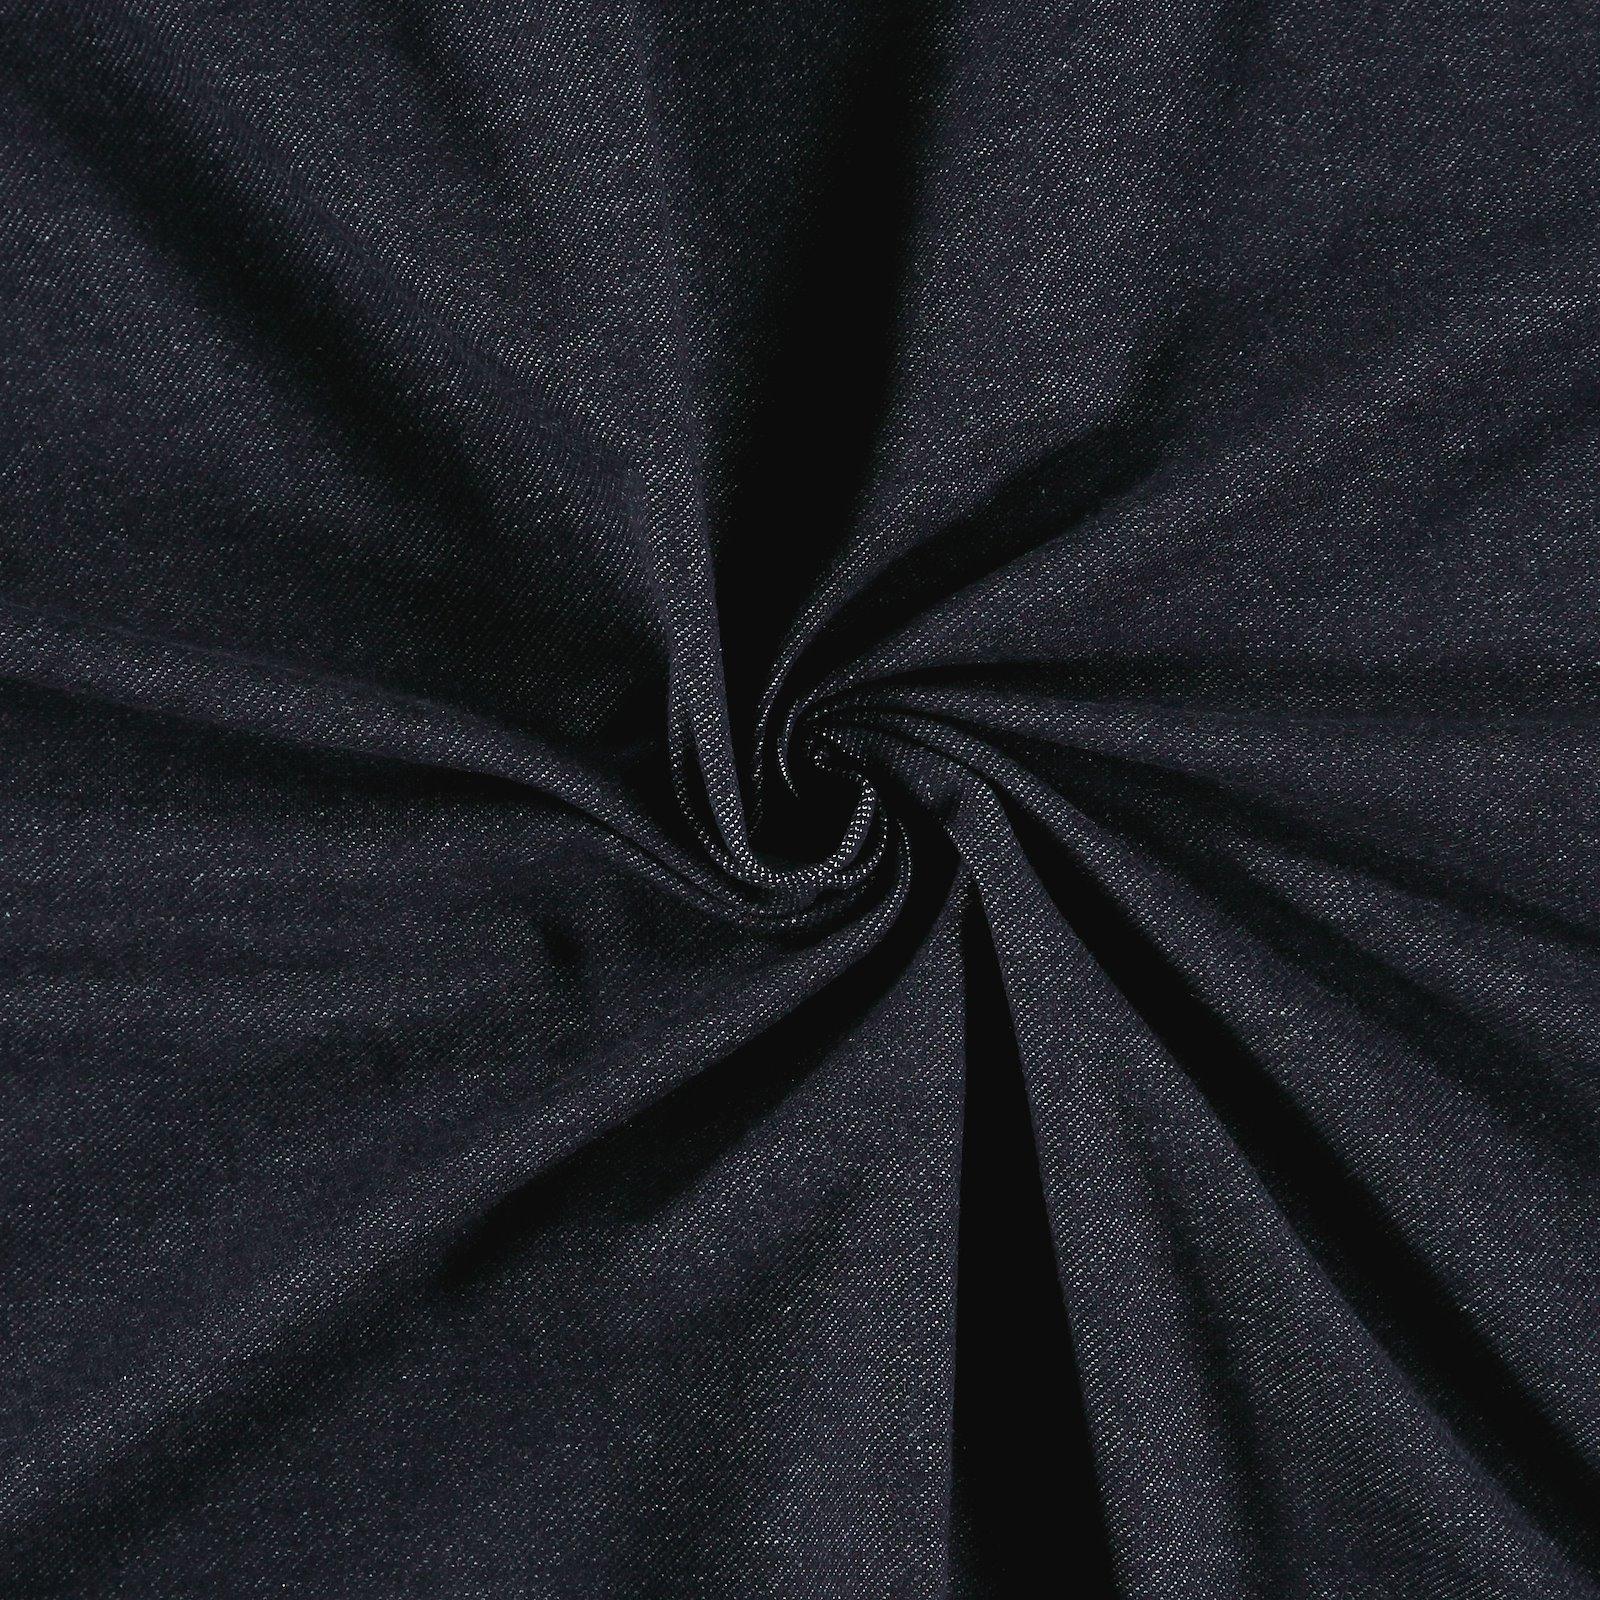 Stretch jersey denim look dark denimblue 206141_pack